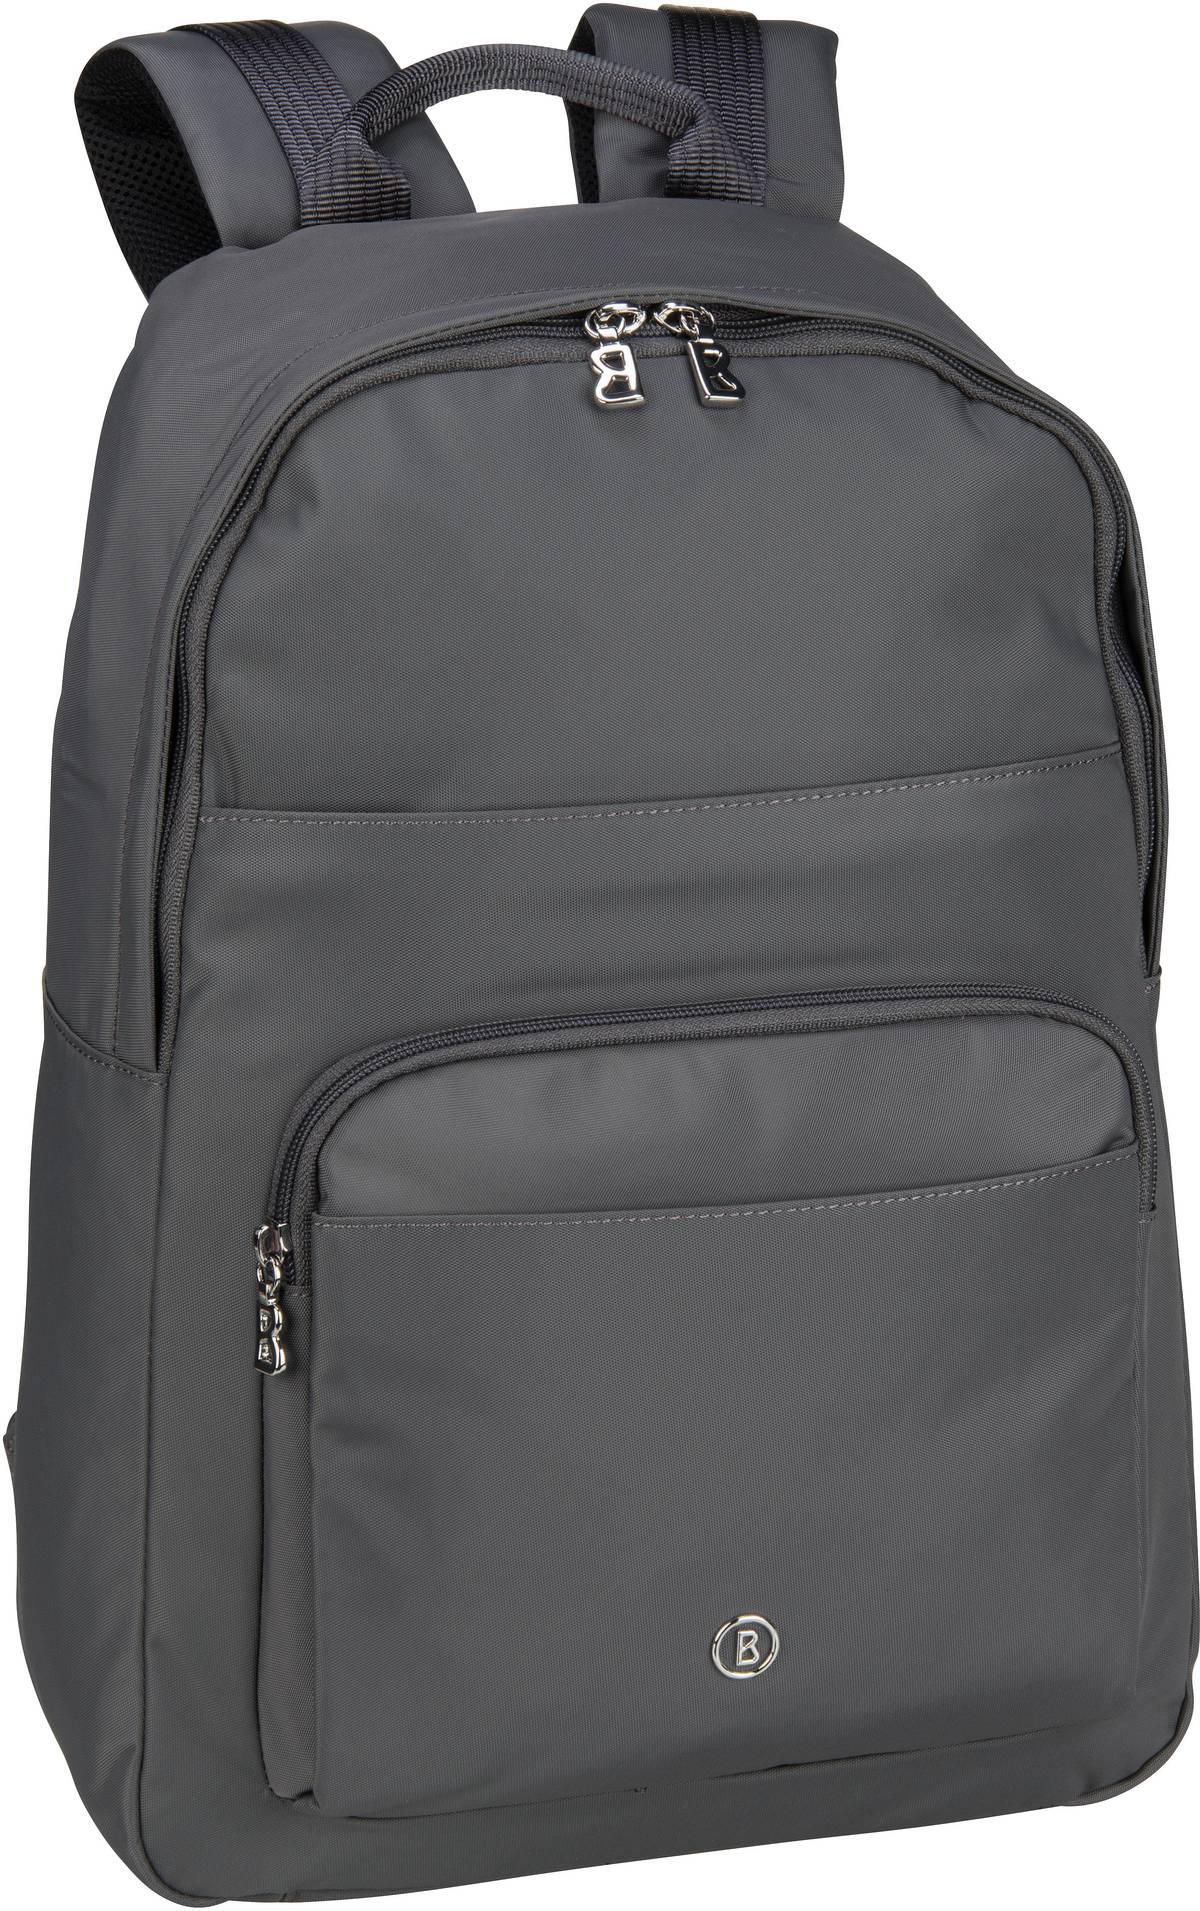 Rucksack / Daypack Verbier Henri BackPack MVZ Dark Grey